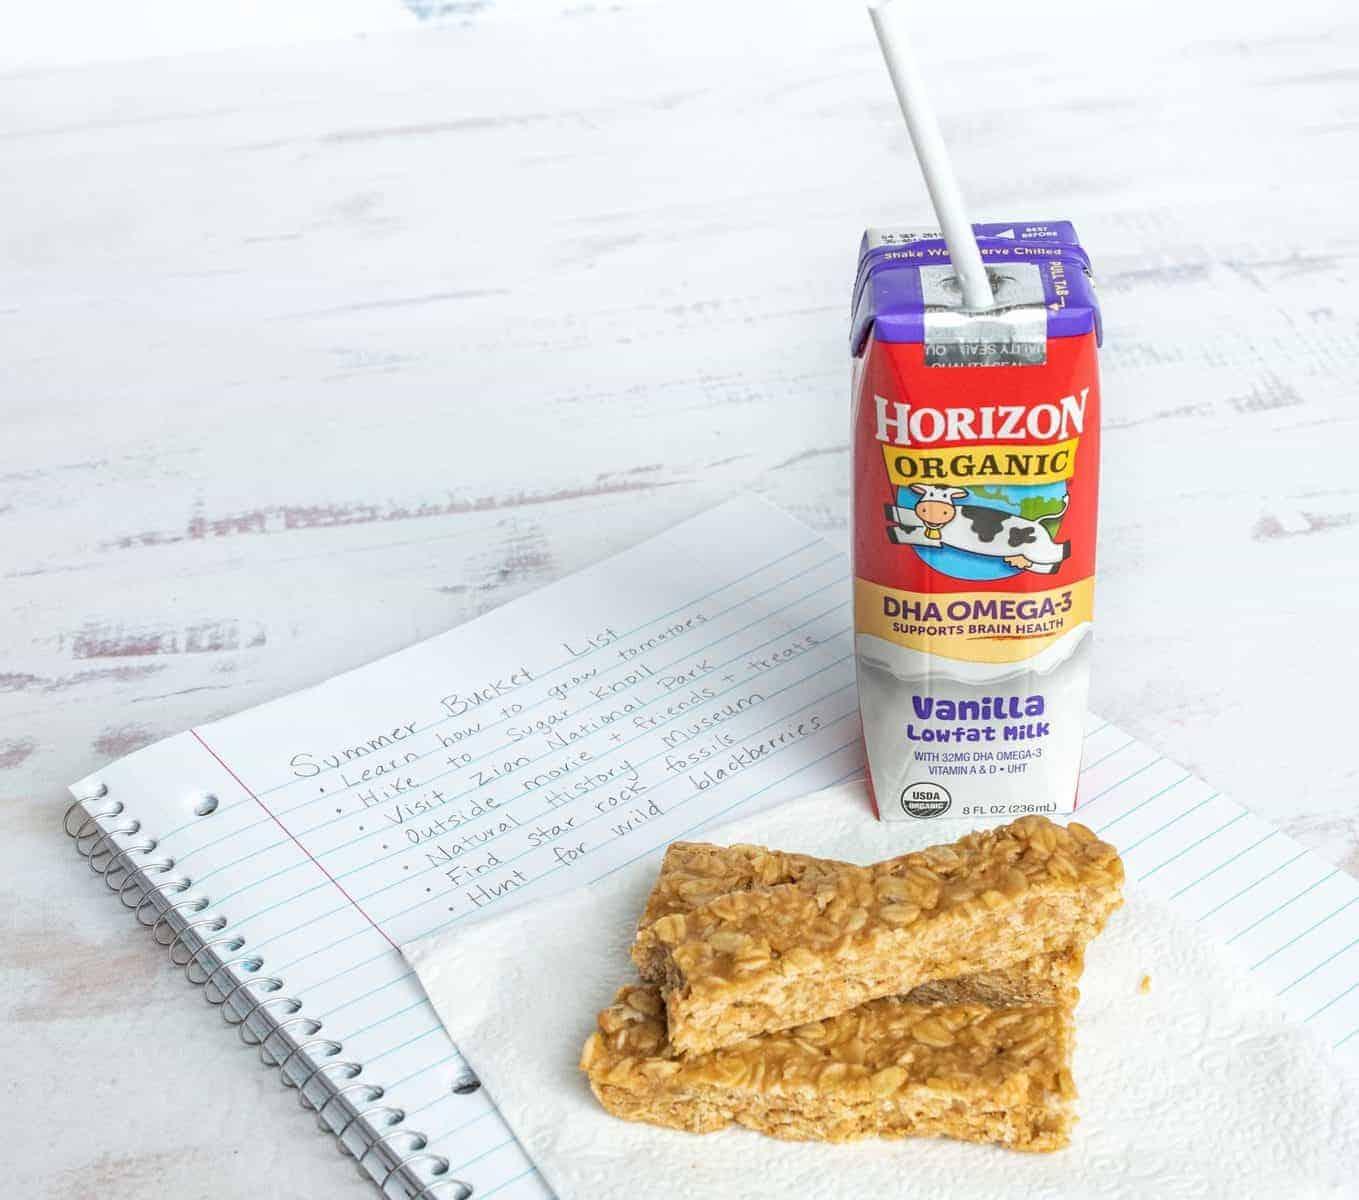 Image of No BakePeanut Butter Honey Granola Bars with Horizon's Organic DHA Omega-3 Milk